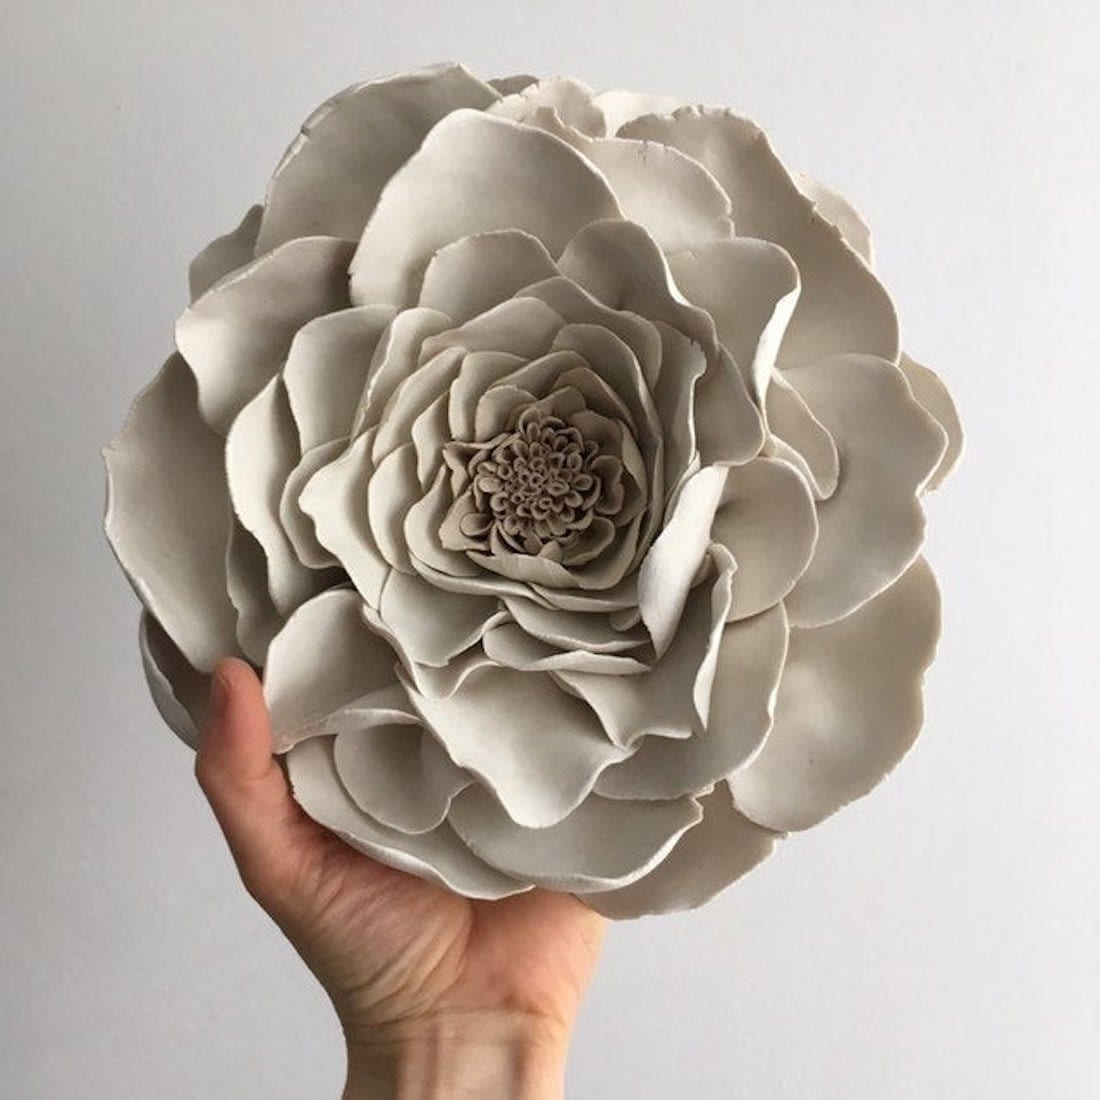 Porcelain gardenia wall flower from MAAPSTUDIO Artworks